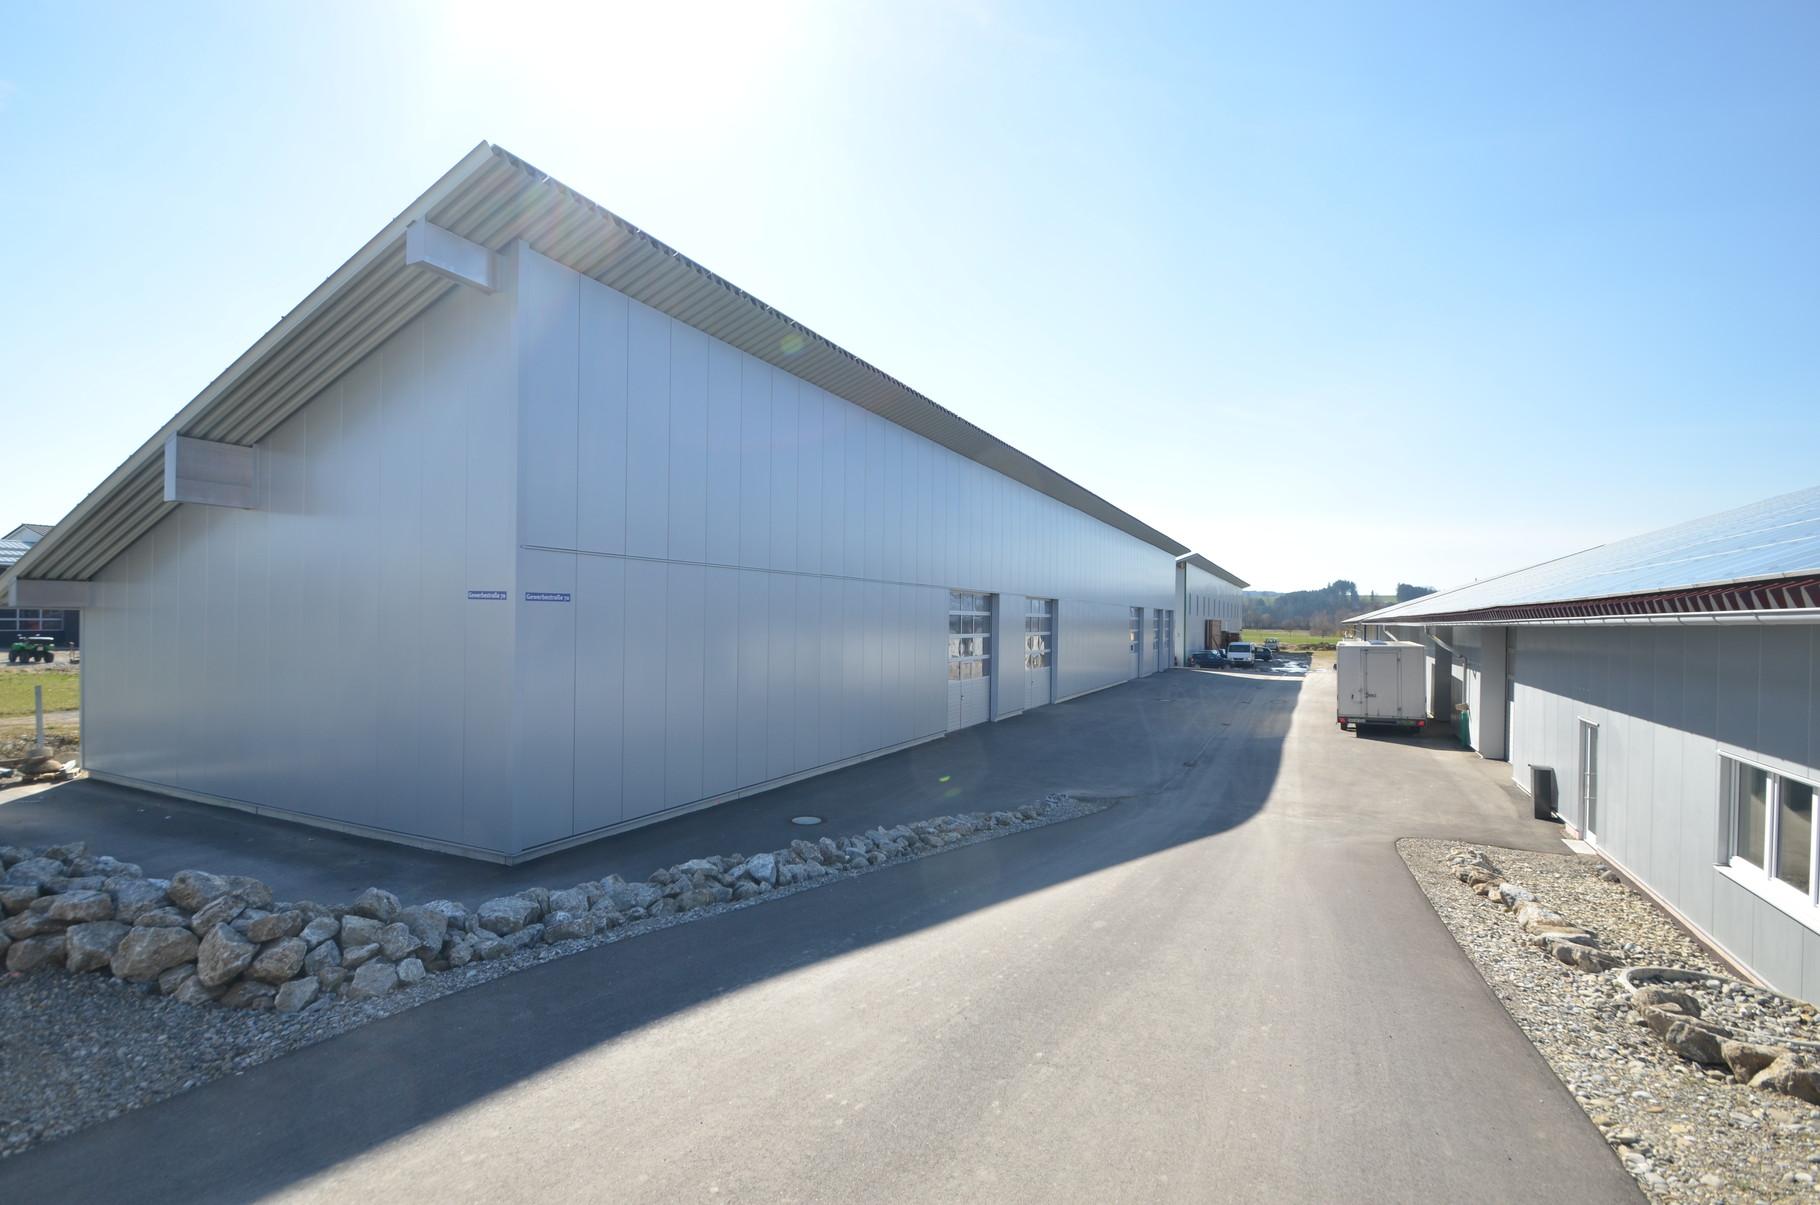 BV: Krugzell/Altusried Schlüsselfertige Fertigstellung zweier Lagerhallen